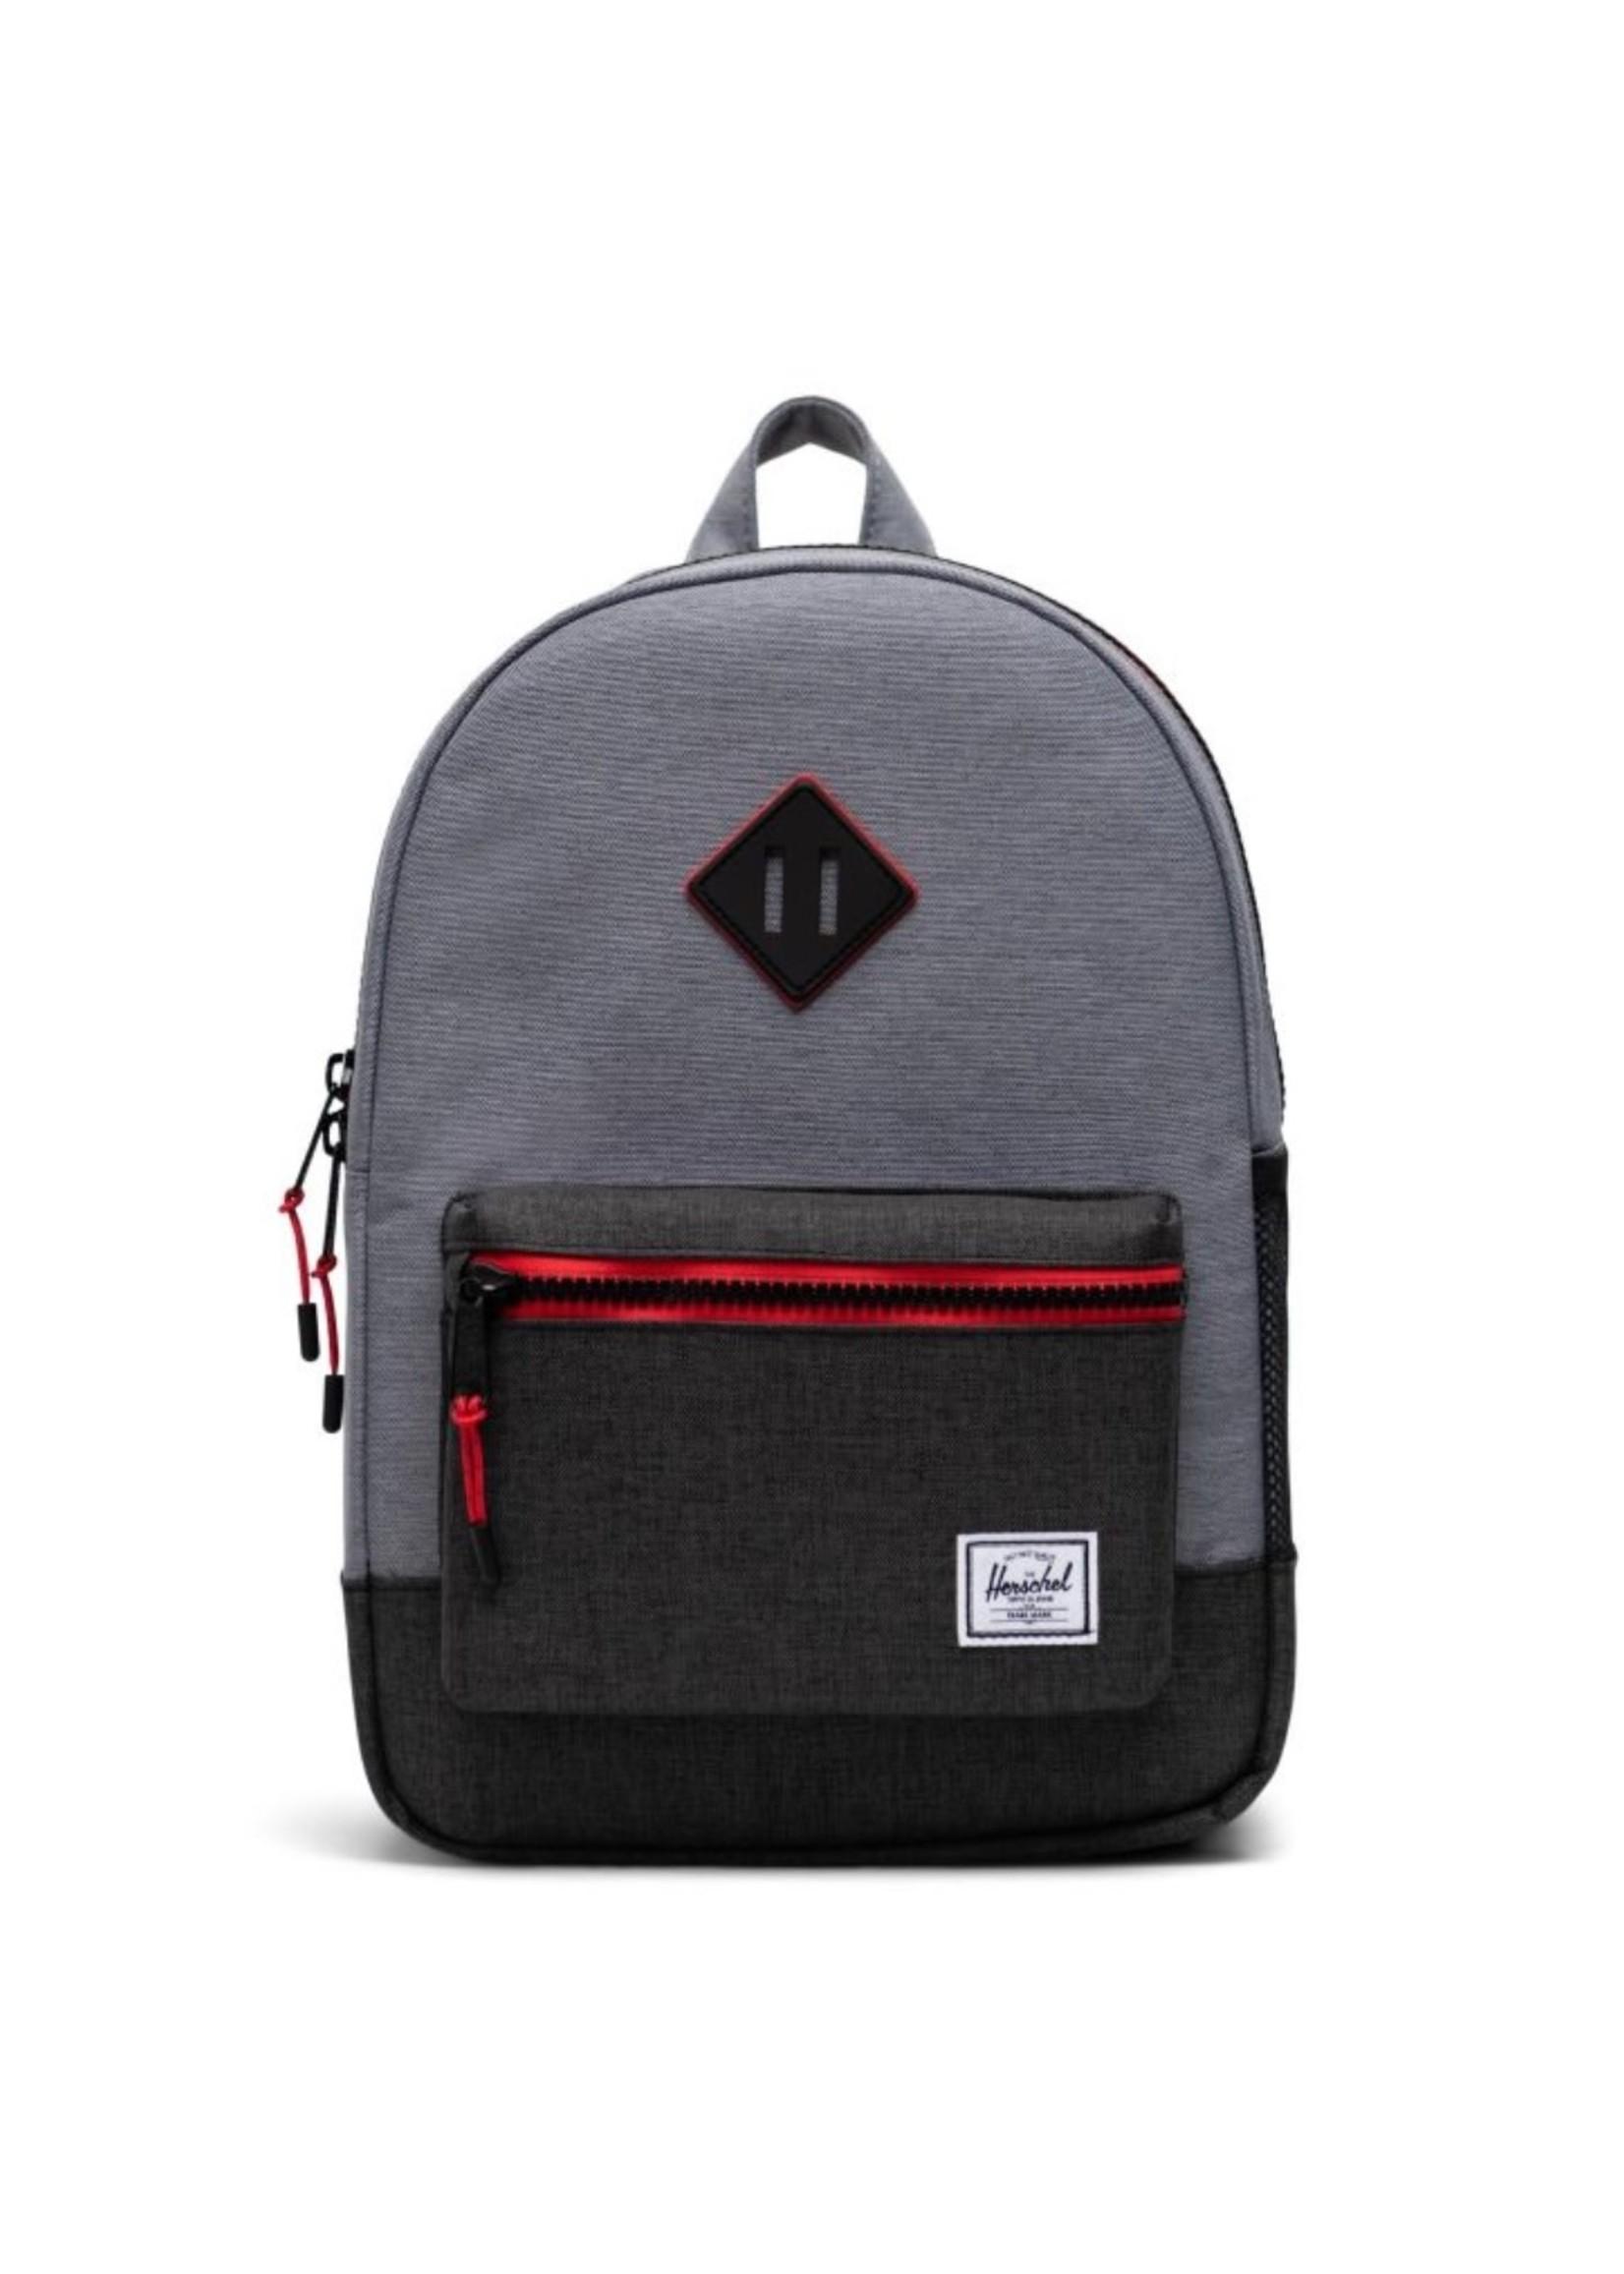 Herschel Supply Co. Heritage Backpack | Youth XL, Mid Grey Crosshatch/Black Crosshatch, 22L